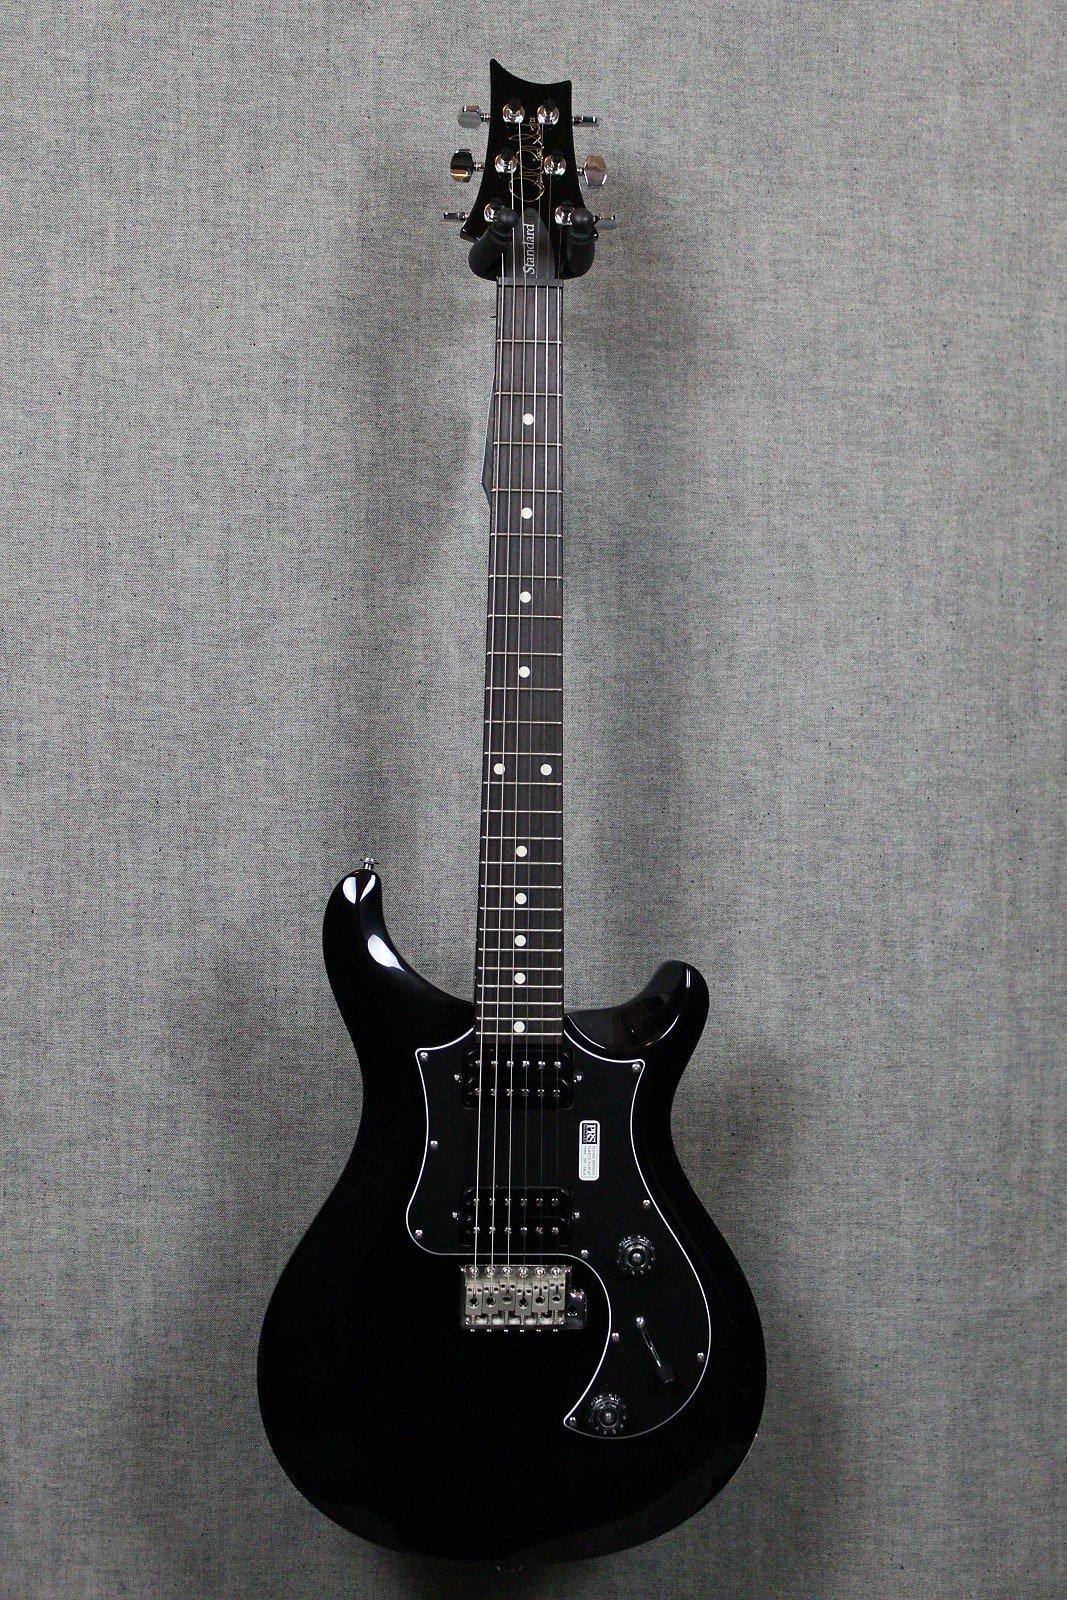 Paul Reed Smith S2 Standard 24 - Black (2018)